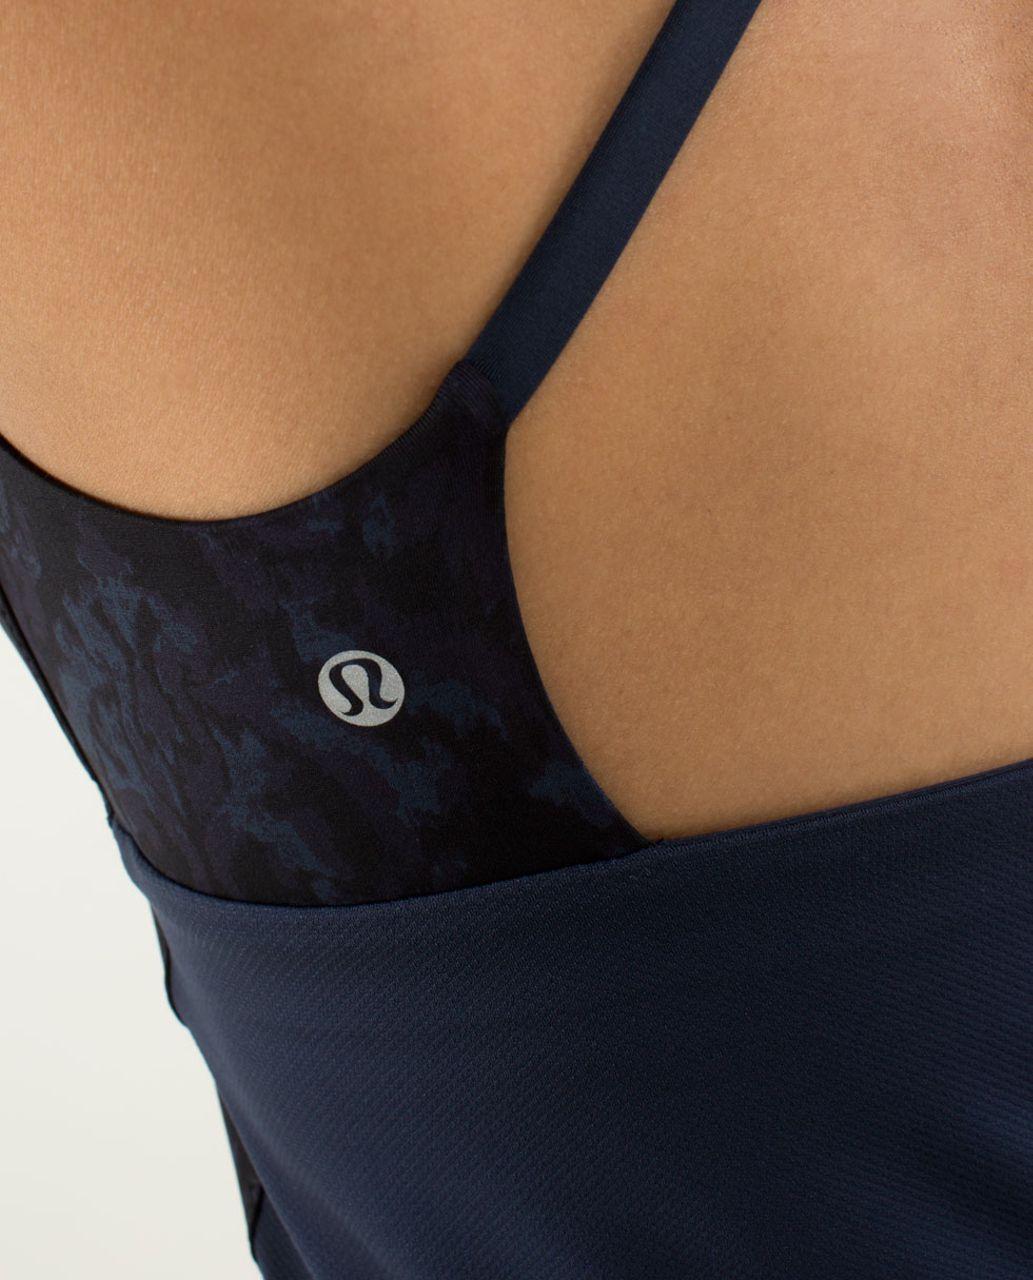 Lululemon Yeah Yoga Tank - Beautiful Baroque Inkwell / Inkwell / Surge